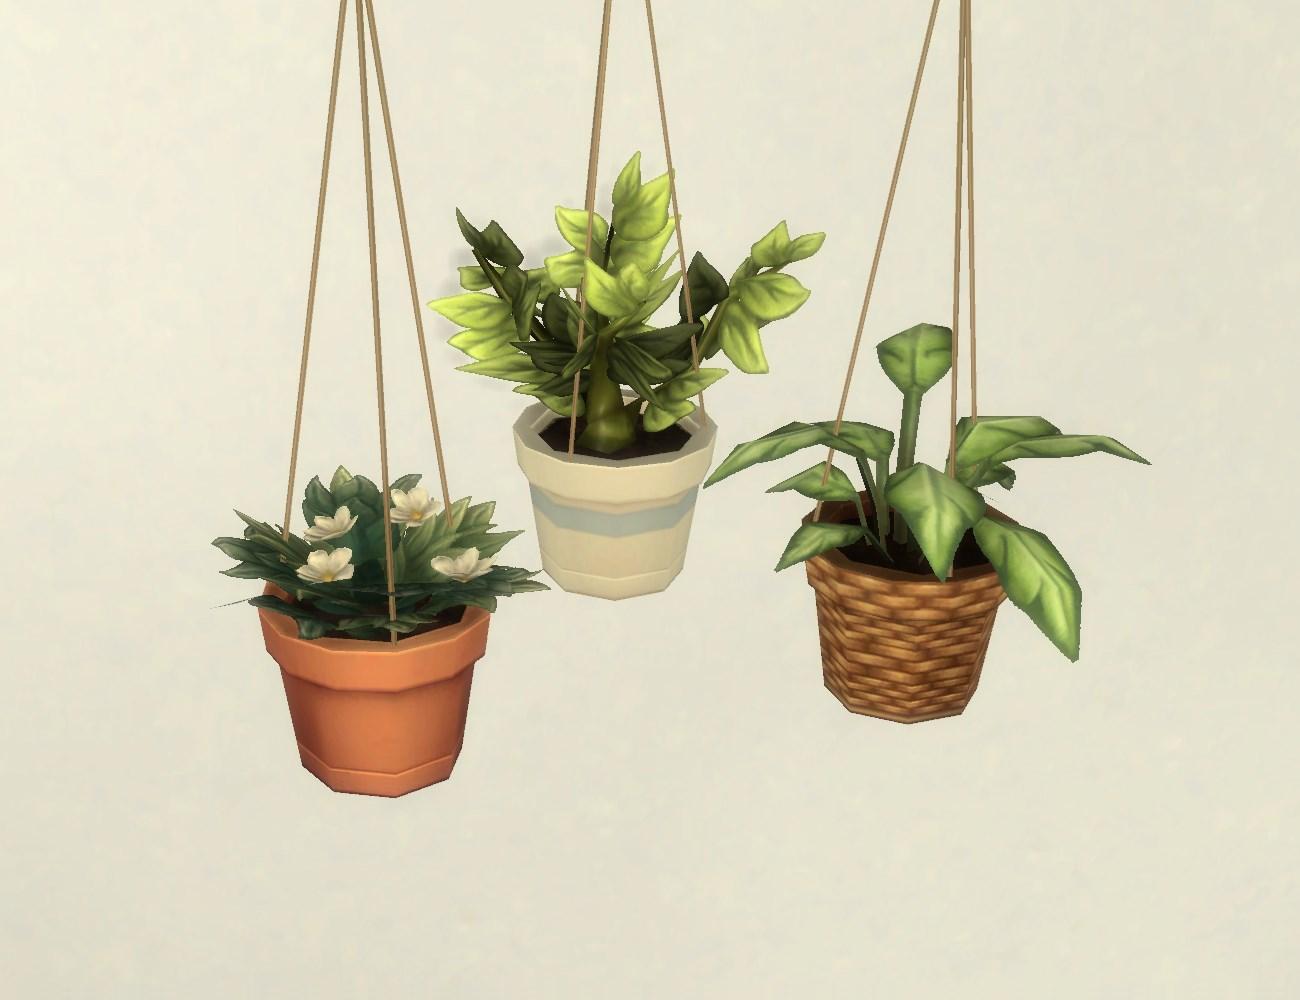 http://thumbs.modthesims2.com/img/1/7/8/2/8/2/MTS_plasticbox-1512688-pbox_plants-hanging-modular_00.jpg